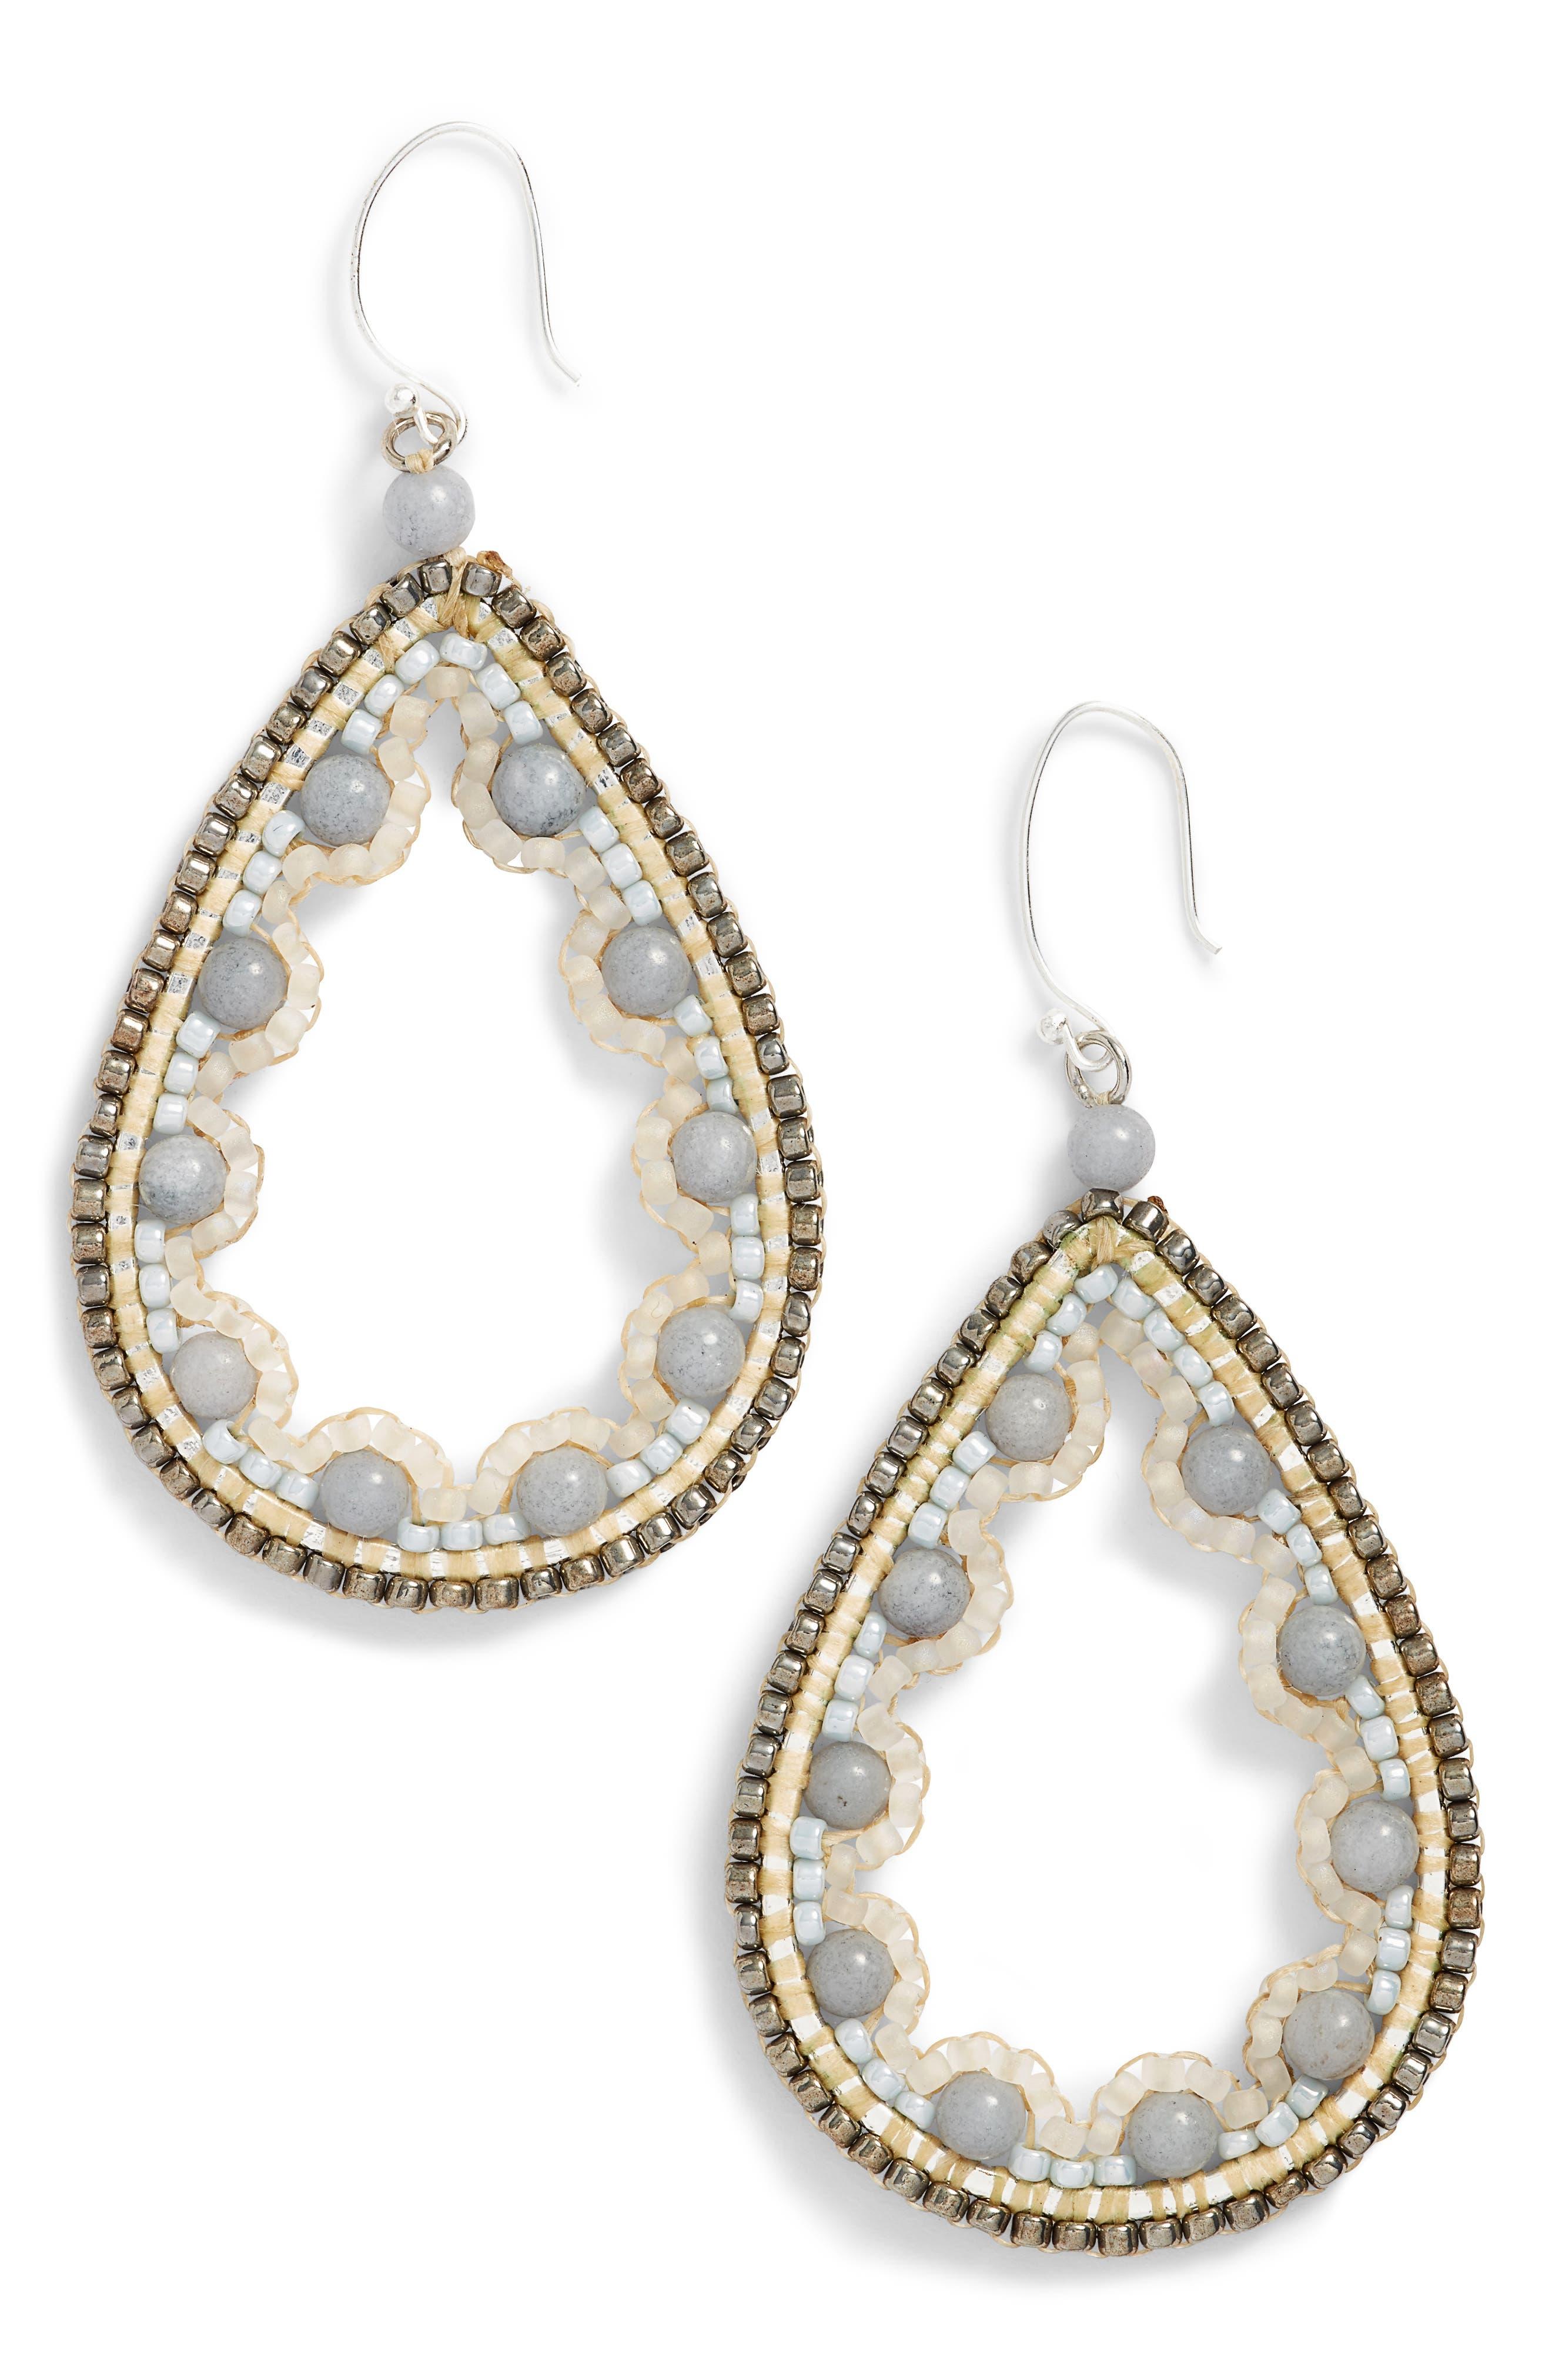 Beaded Agate Teardrop Earrings,                         Main,                         color, 100